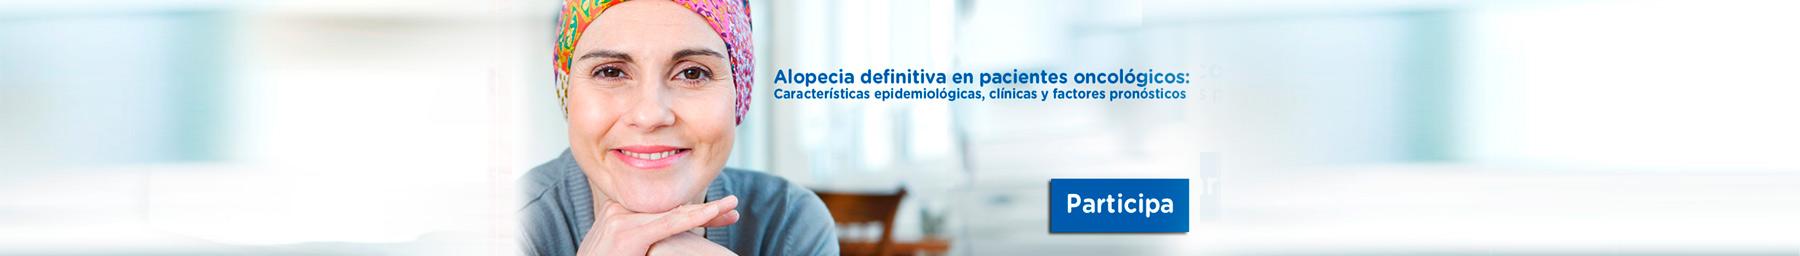 banner-aeal-alopecia2